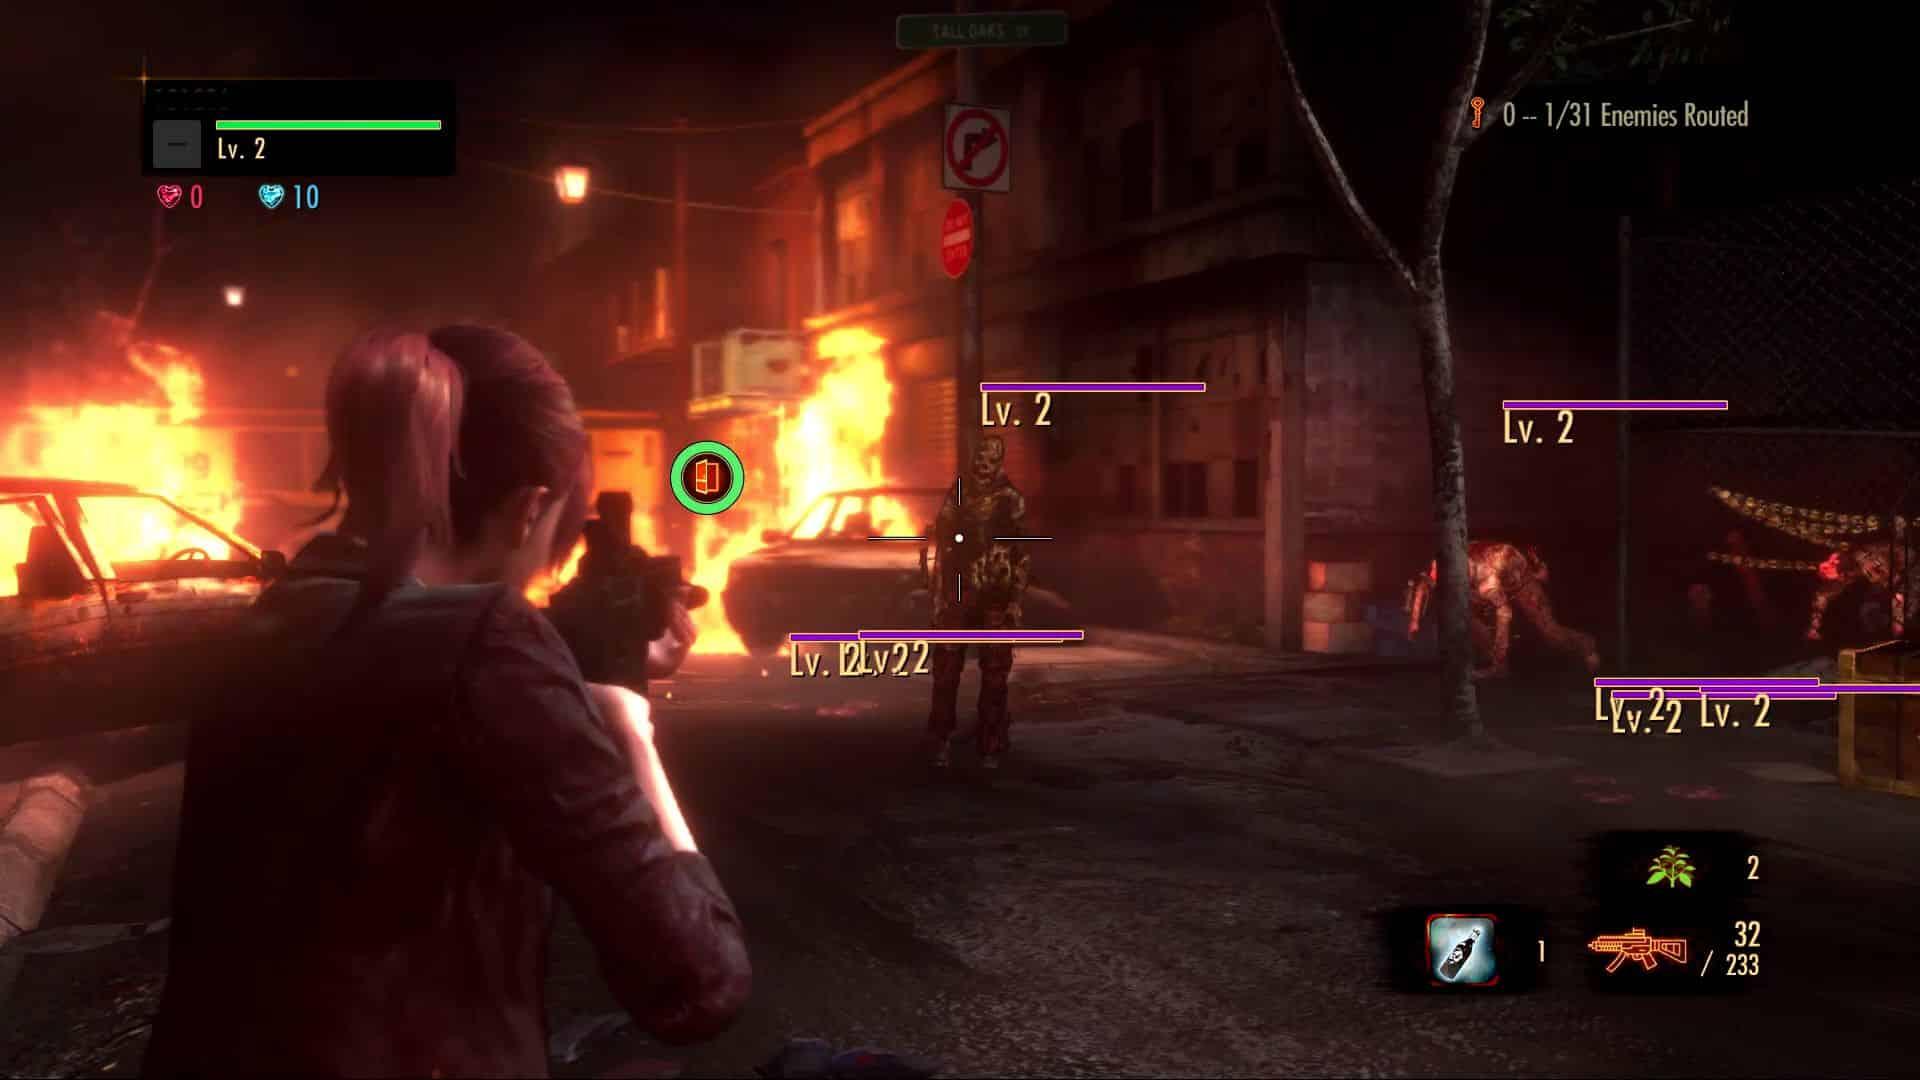 Resident Evil Revelations Raid Mode Capcom franchise celebration Resident Evil Revelations 2, evolving Mercenaries, not as weird as Re:Verse